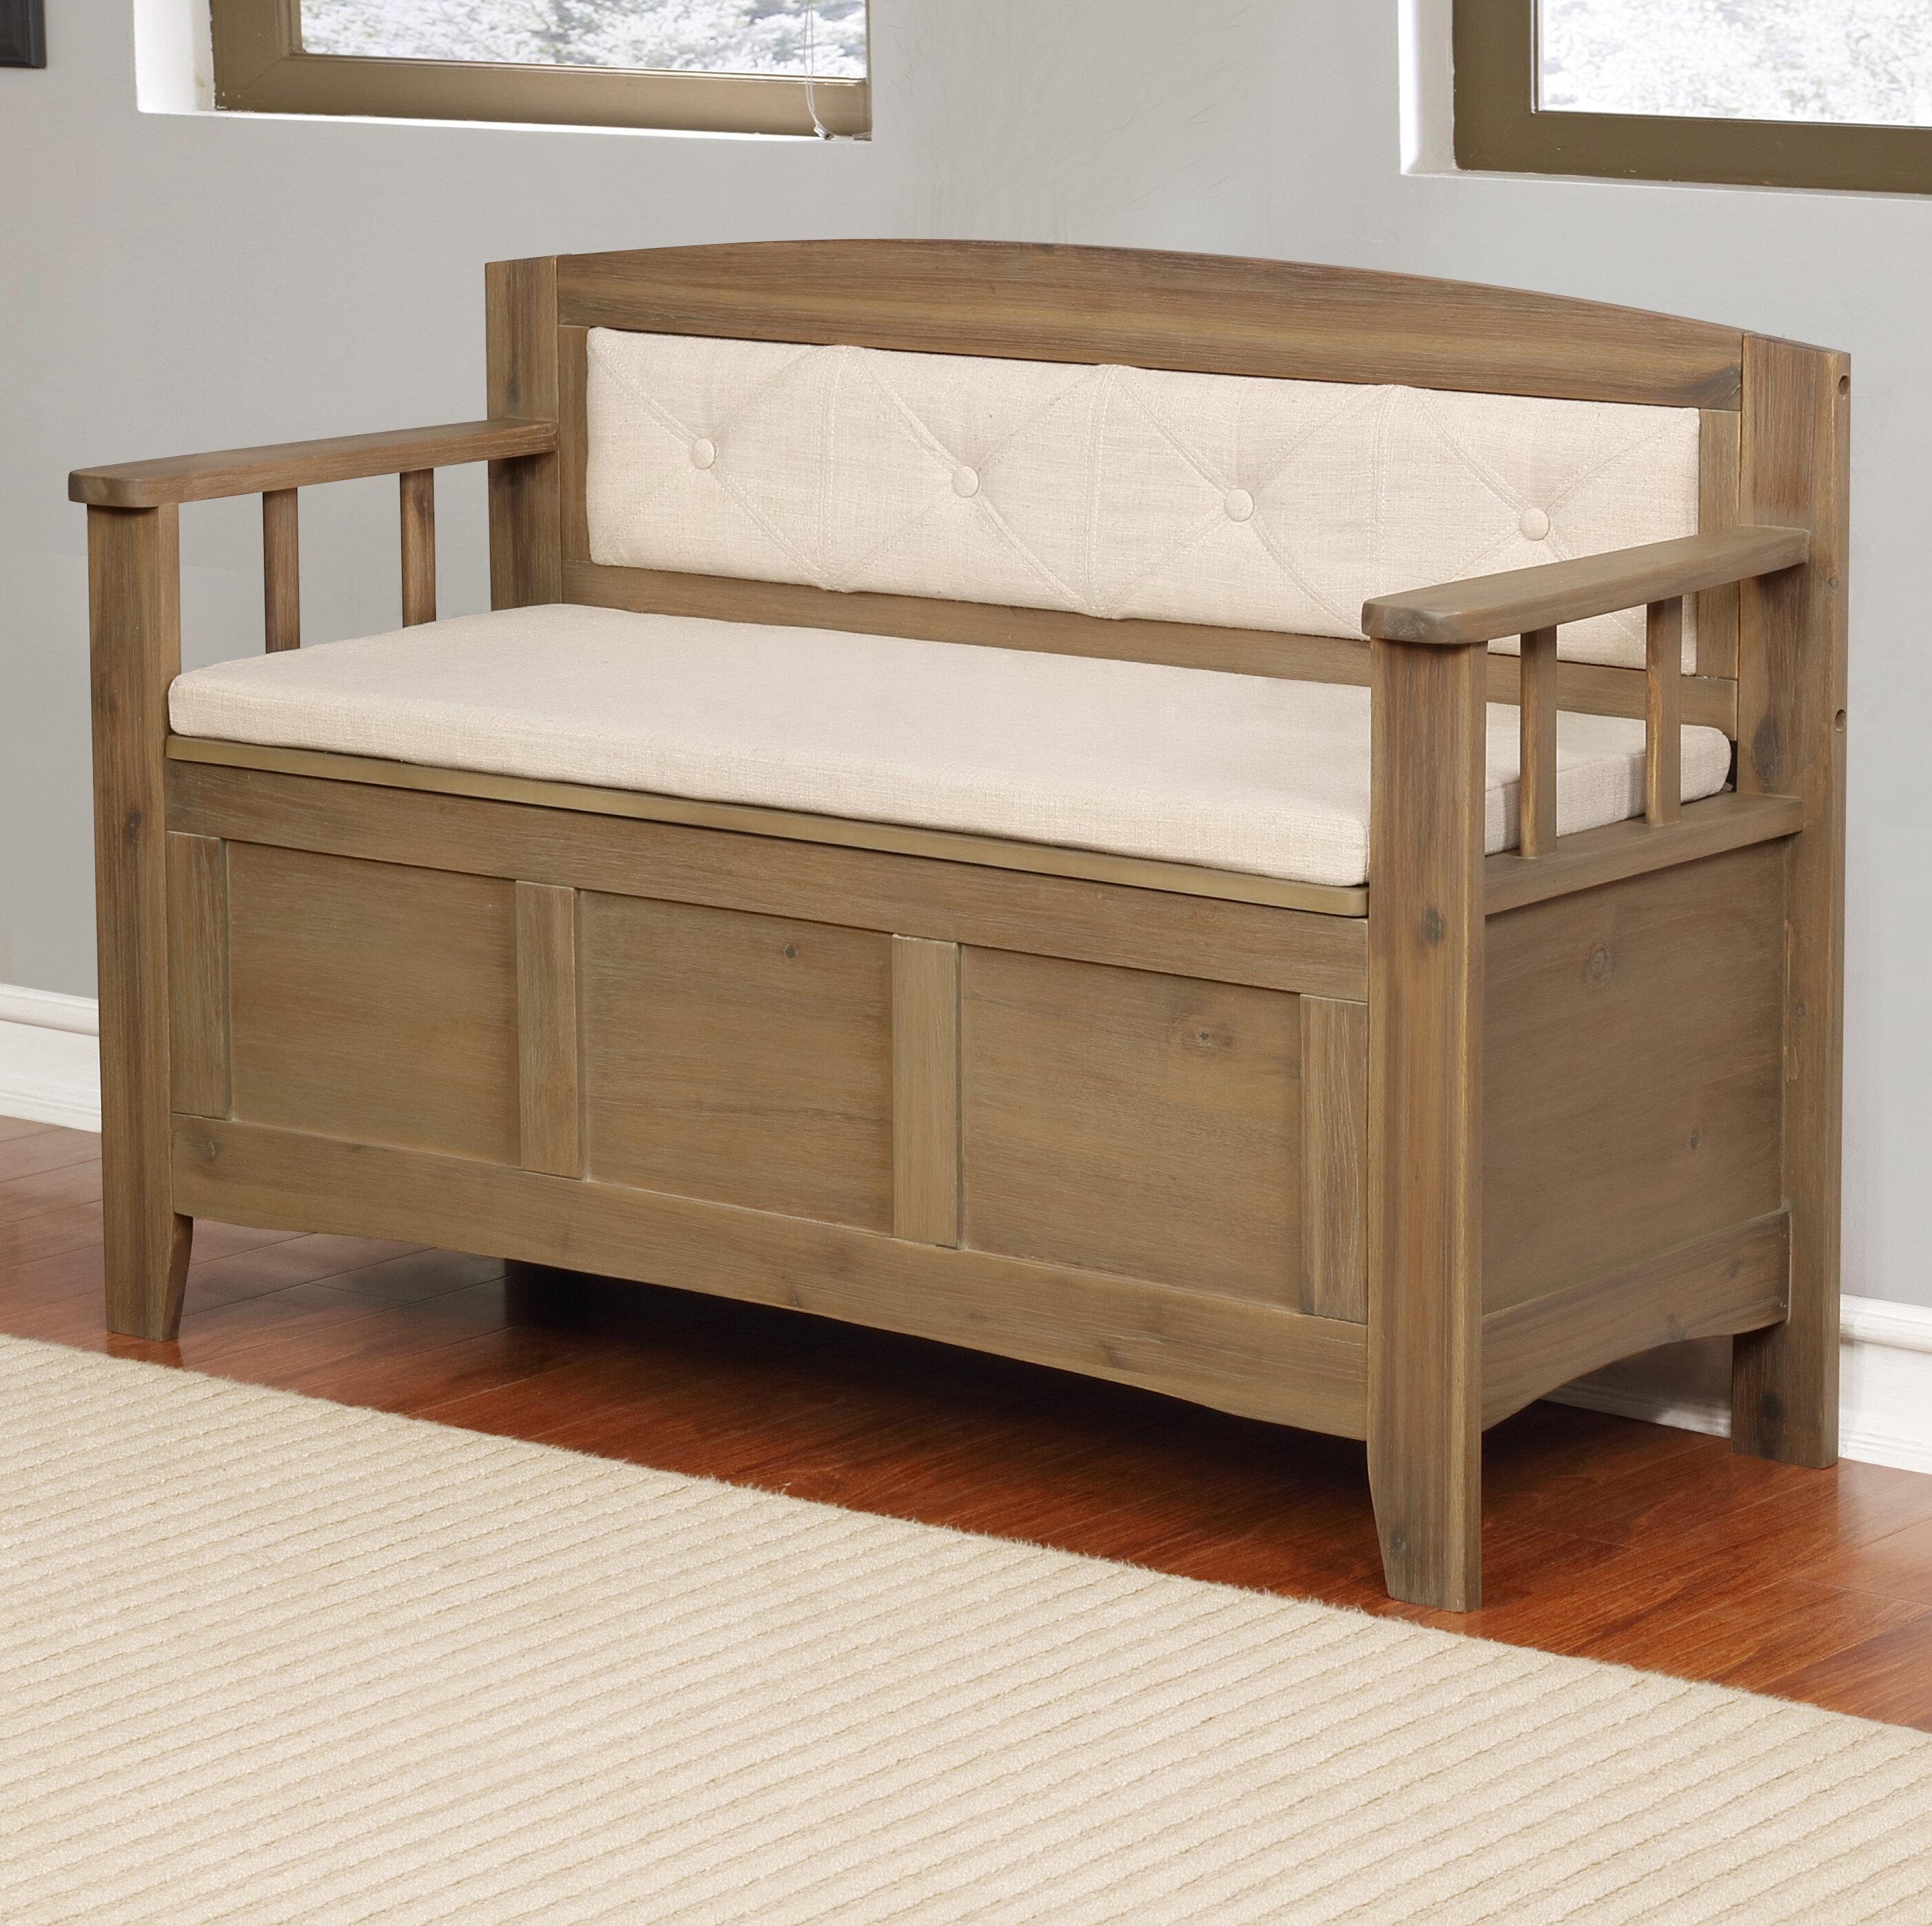 Gracie Oaks Armina Wood Storage Bench Reviews Wayfair